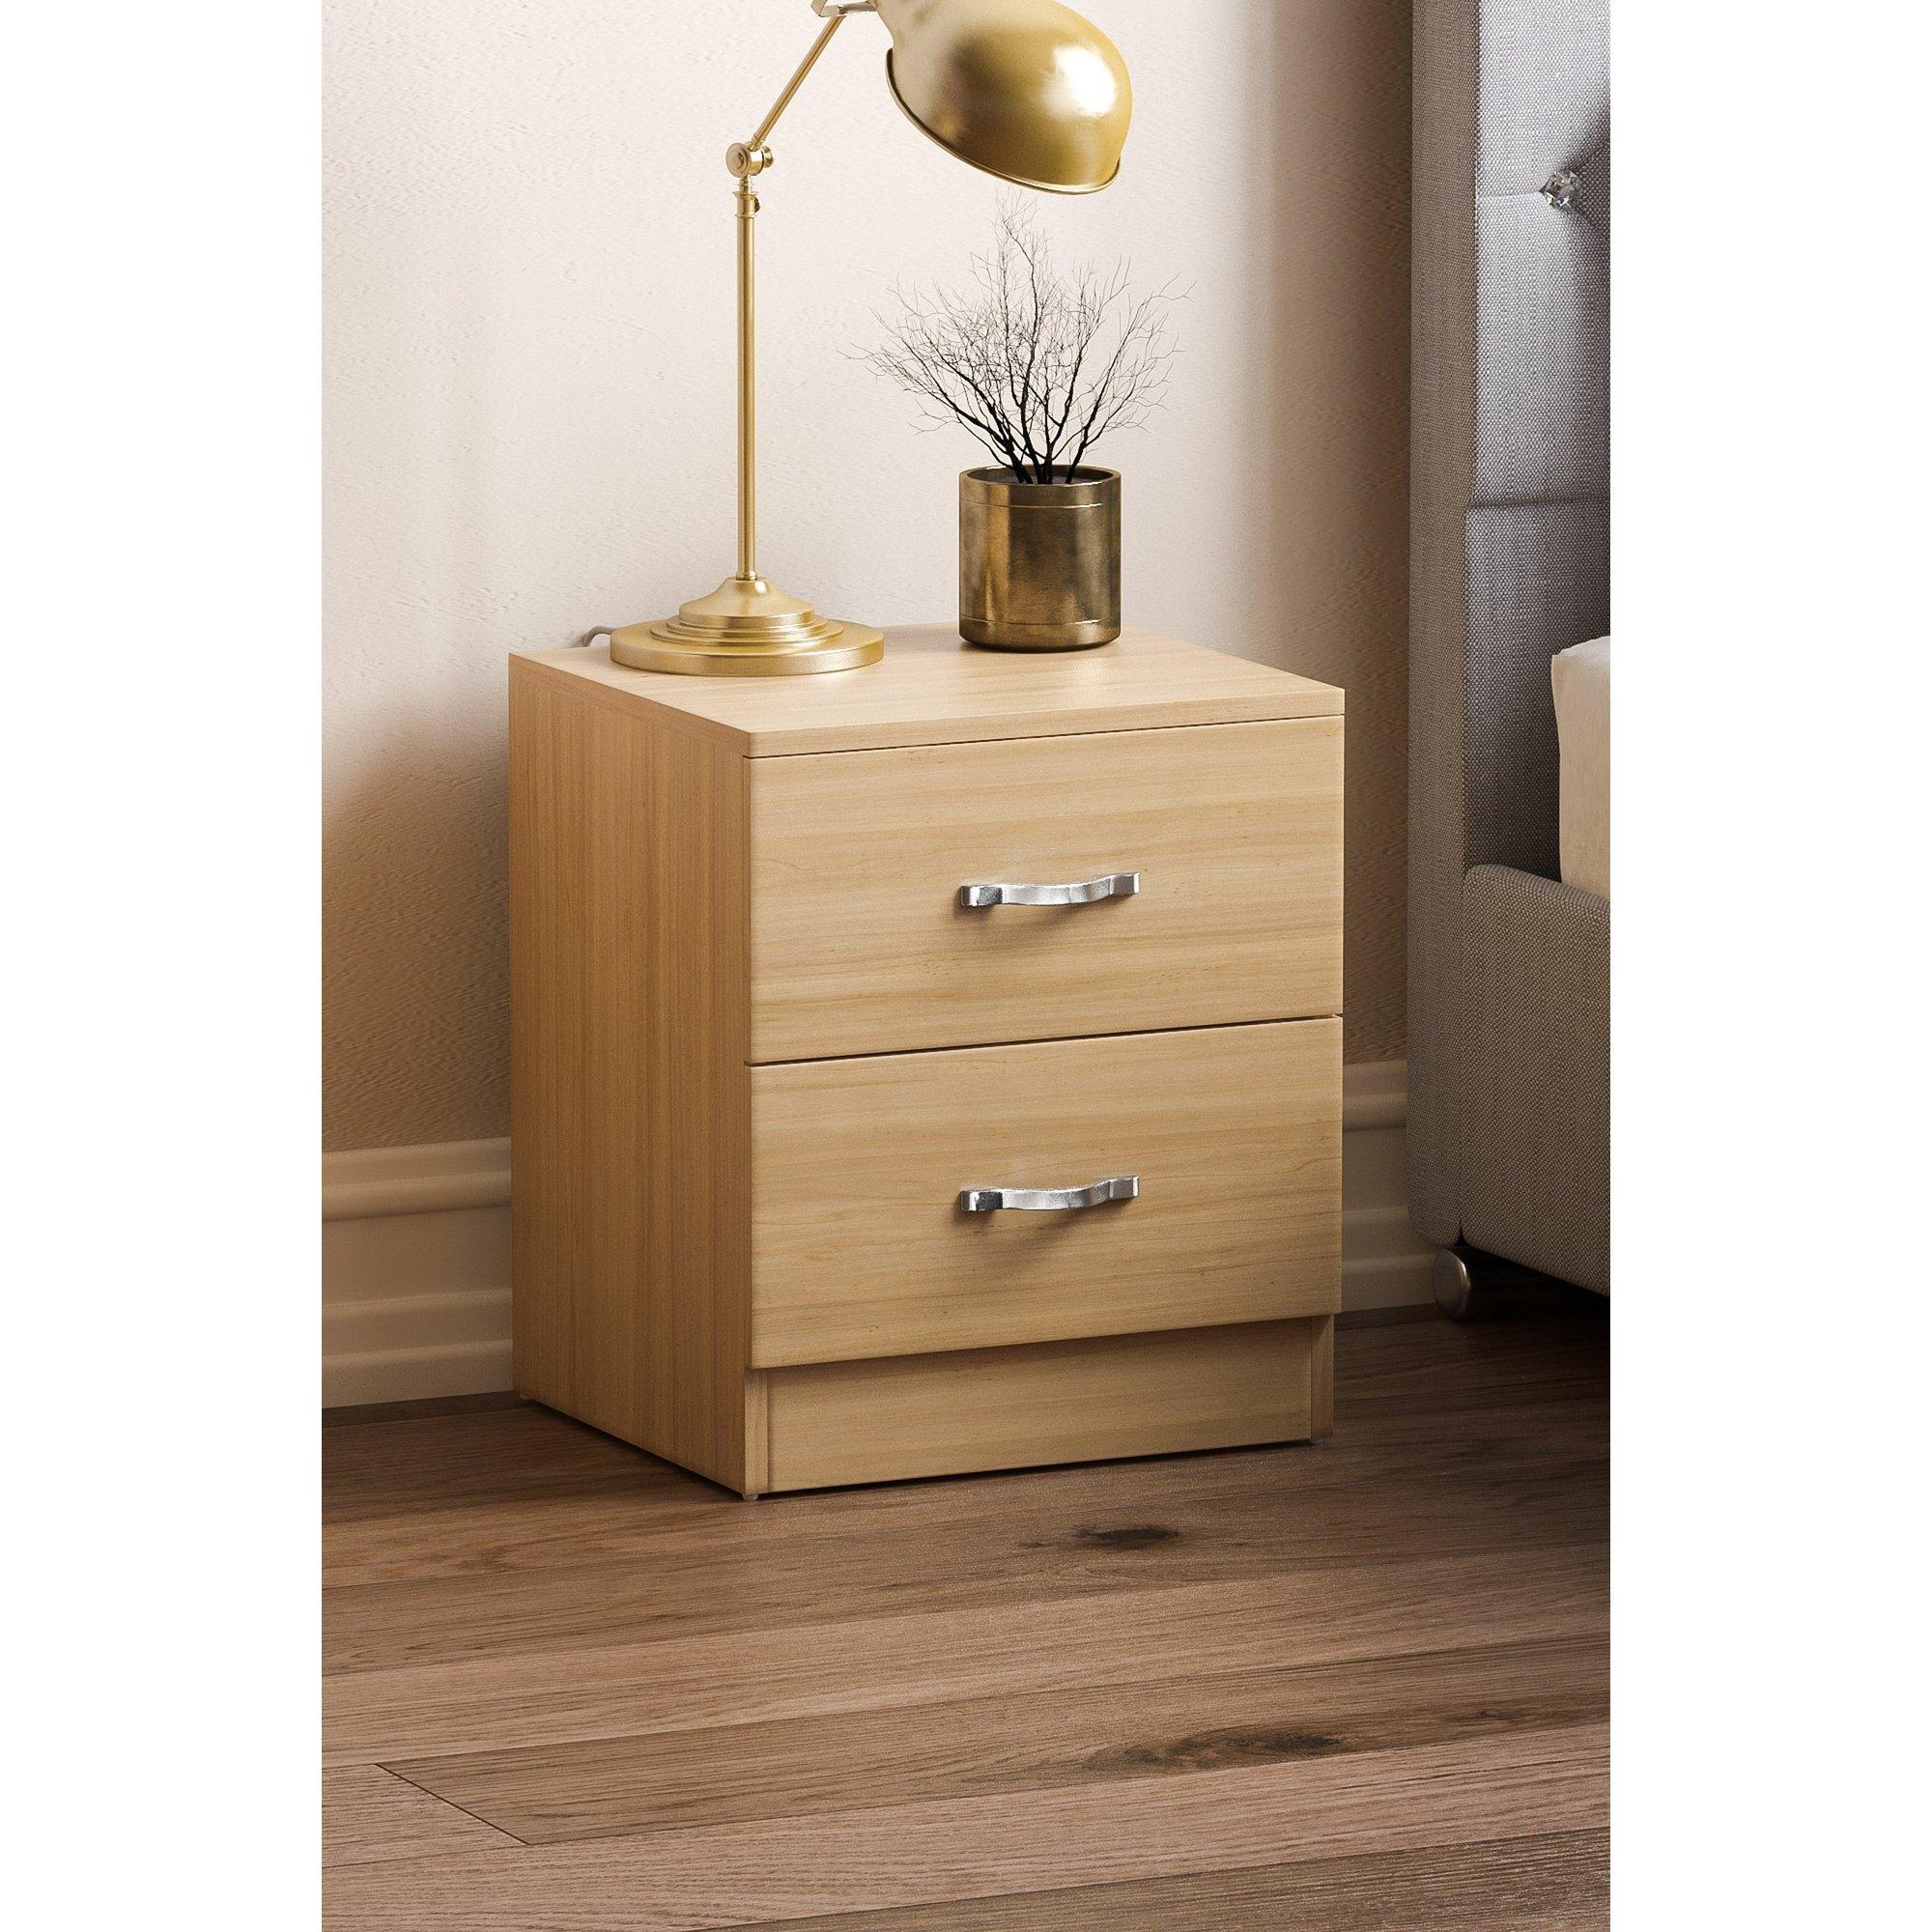 Image of 2 Drawer Bedside Table